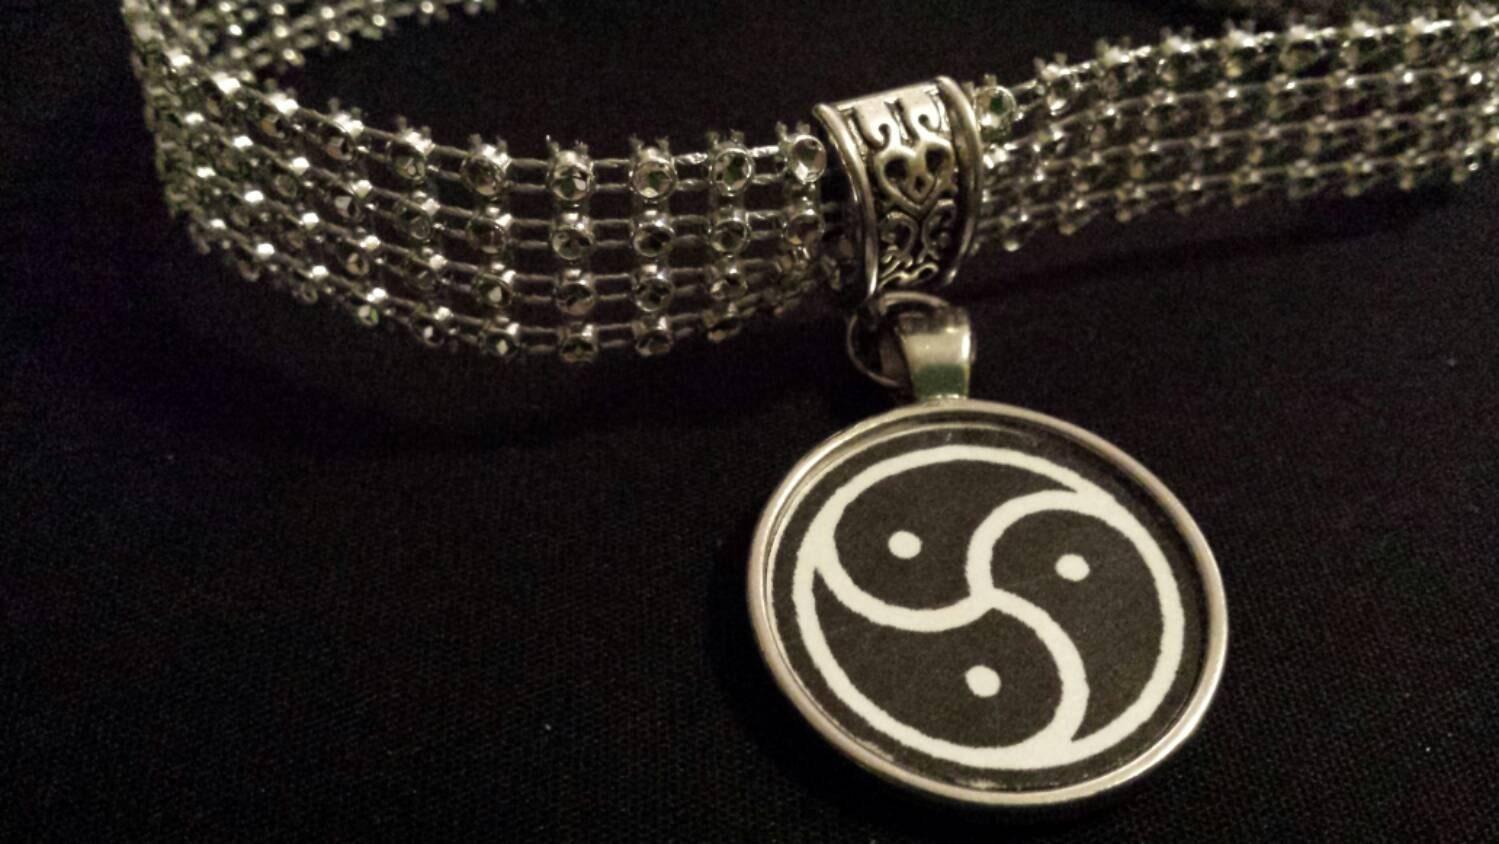 Bdsm jewelry necklace day collar bdsm emblem round pendant zoom biocorpaavc Gallery